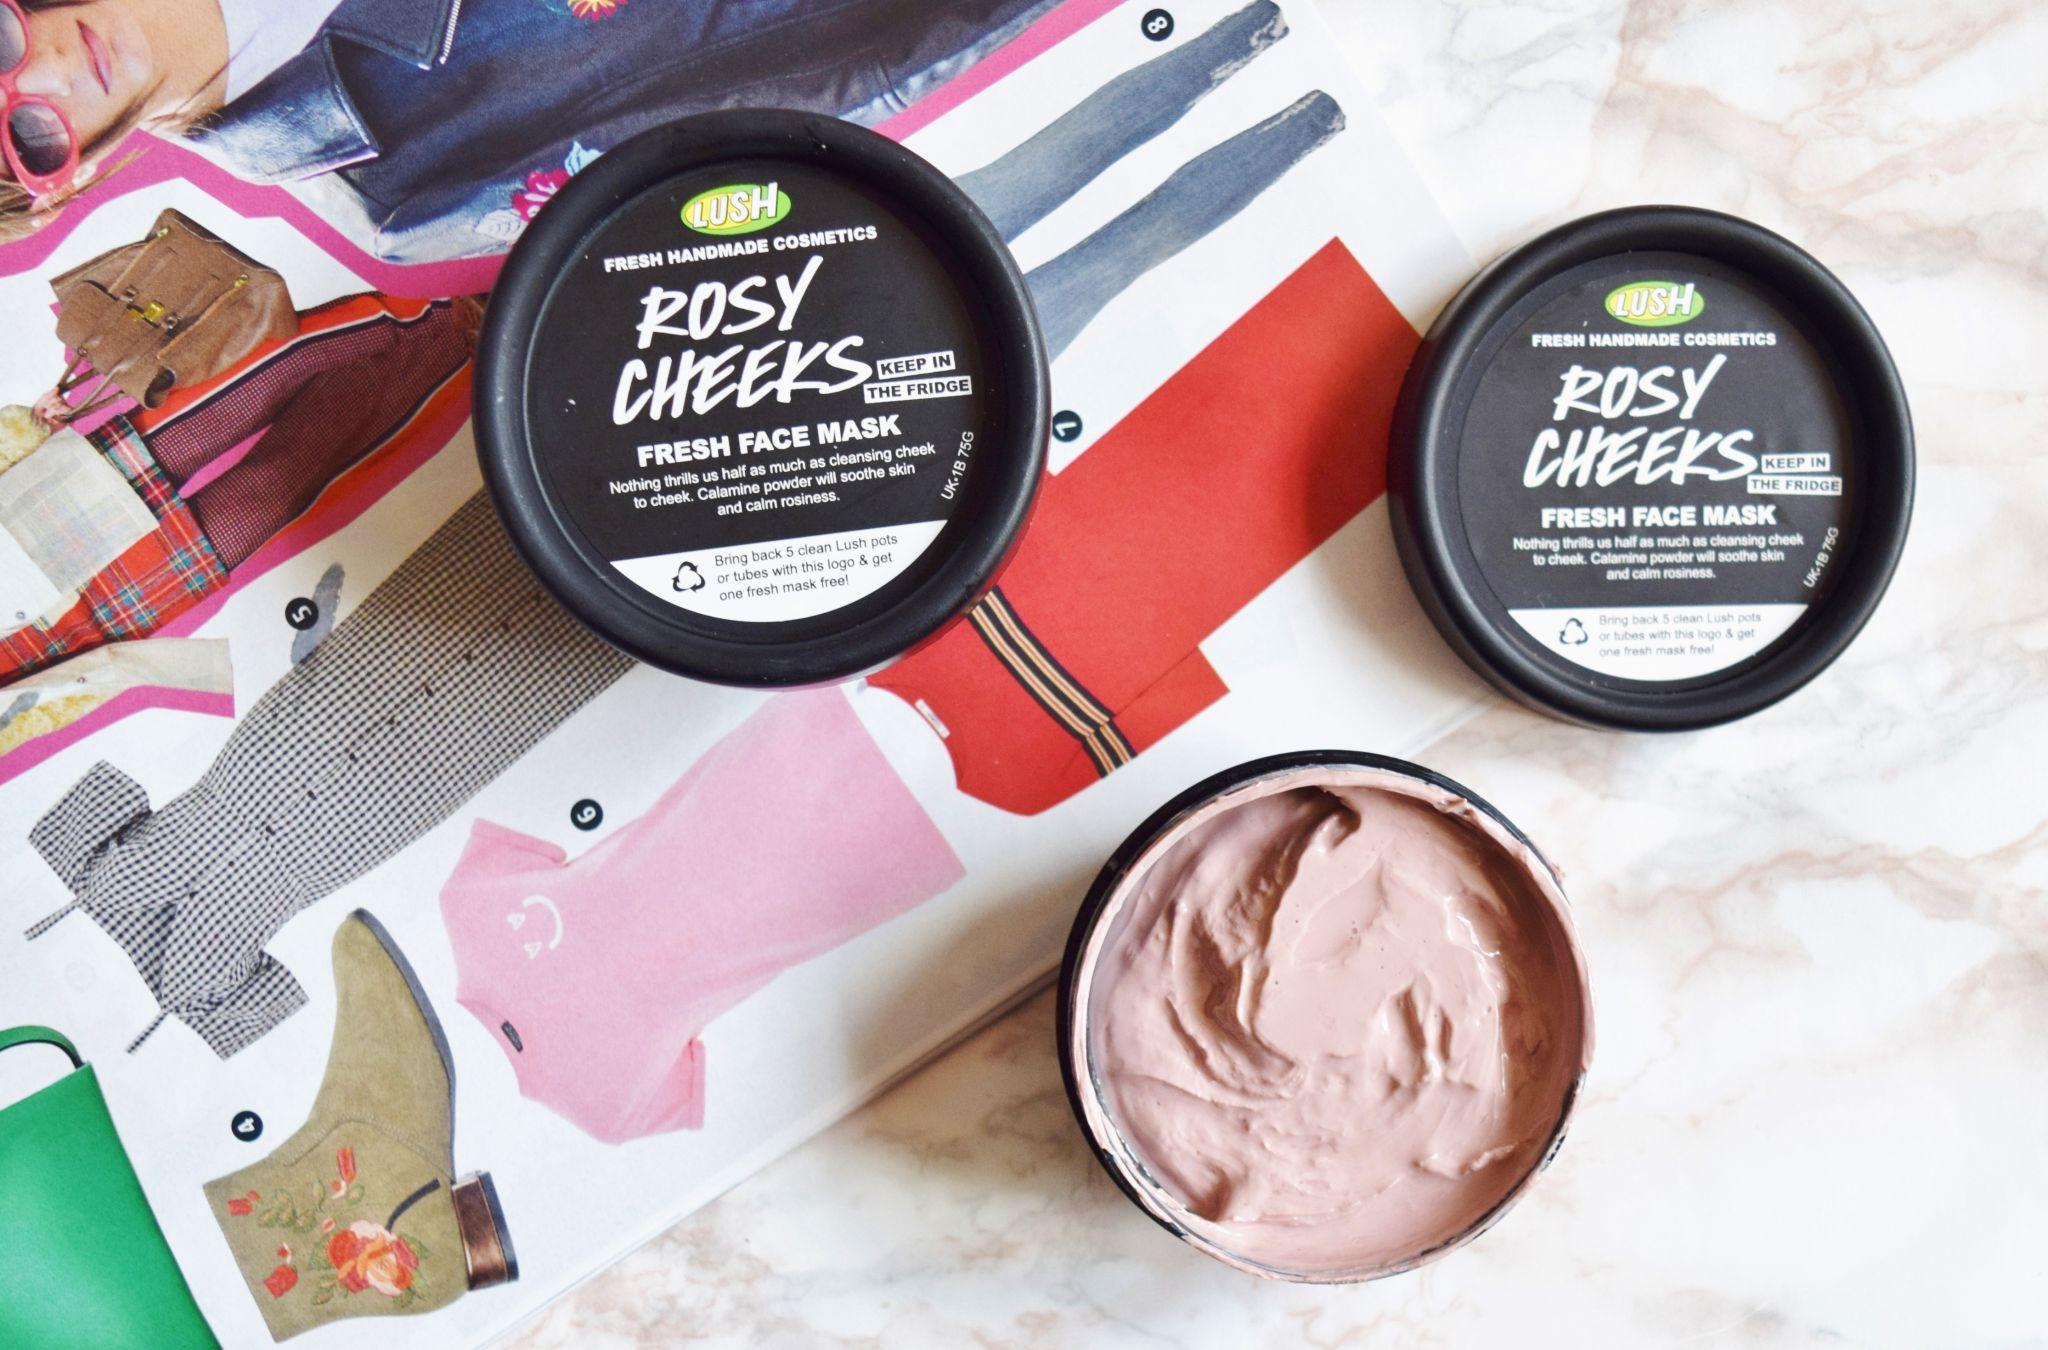 lush rosy cheeks fresh face mask